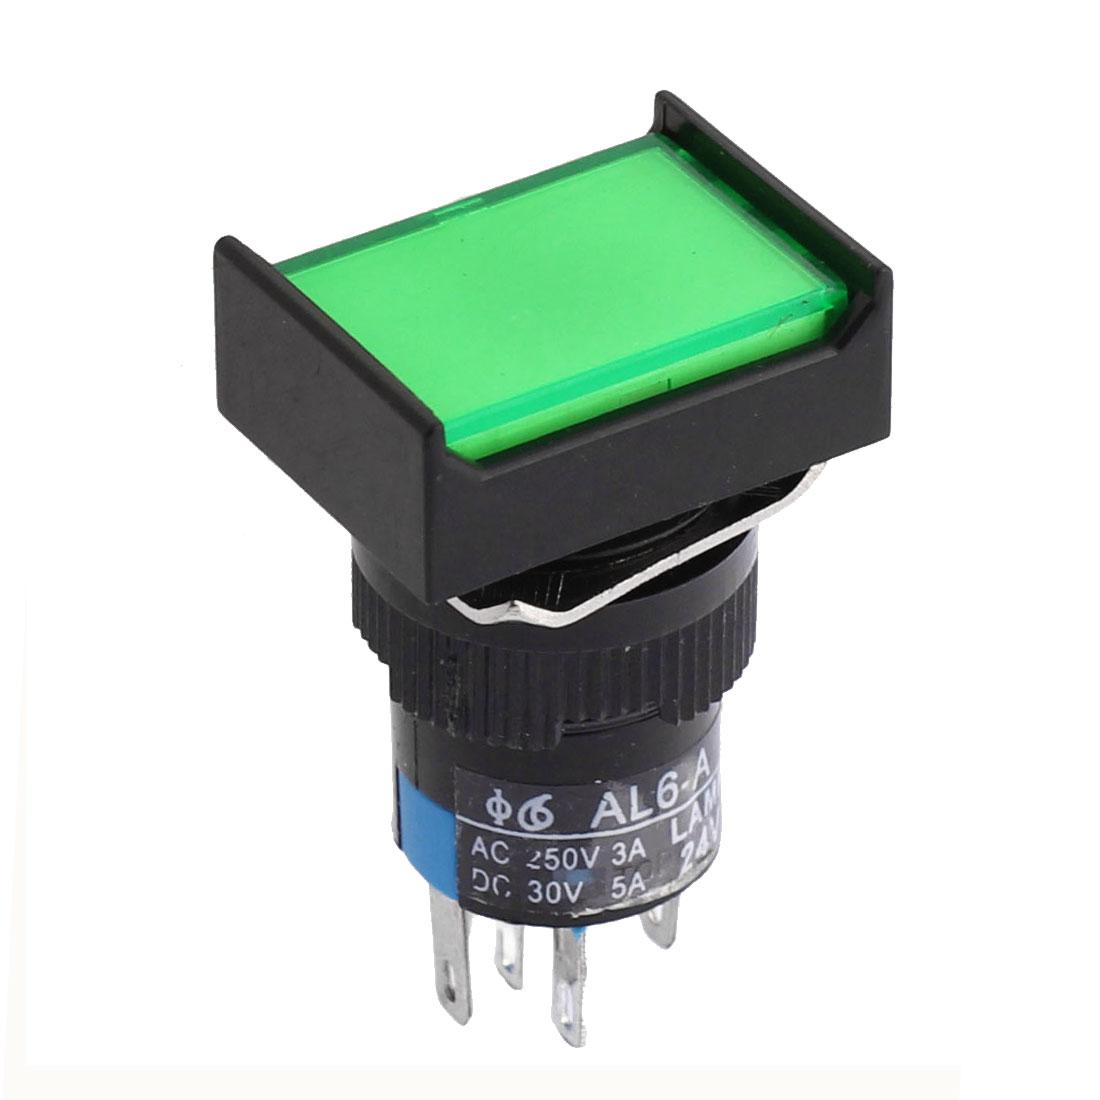 DC 24V Green LED Indicator Light Lamp 16mm Panel Mounting Plastic 1NO 1NC SPDT Latching Rectangular Push Button Switch